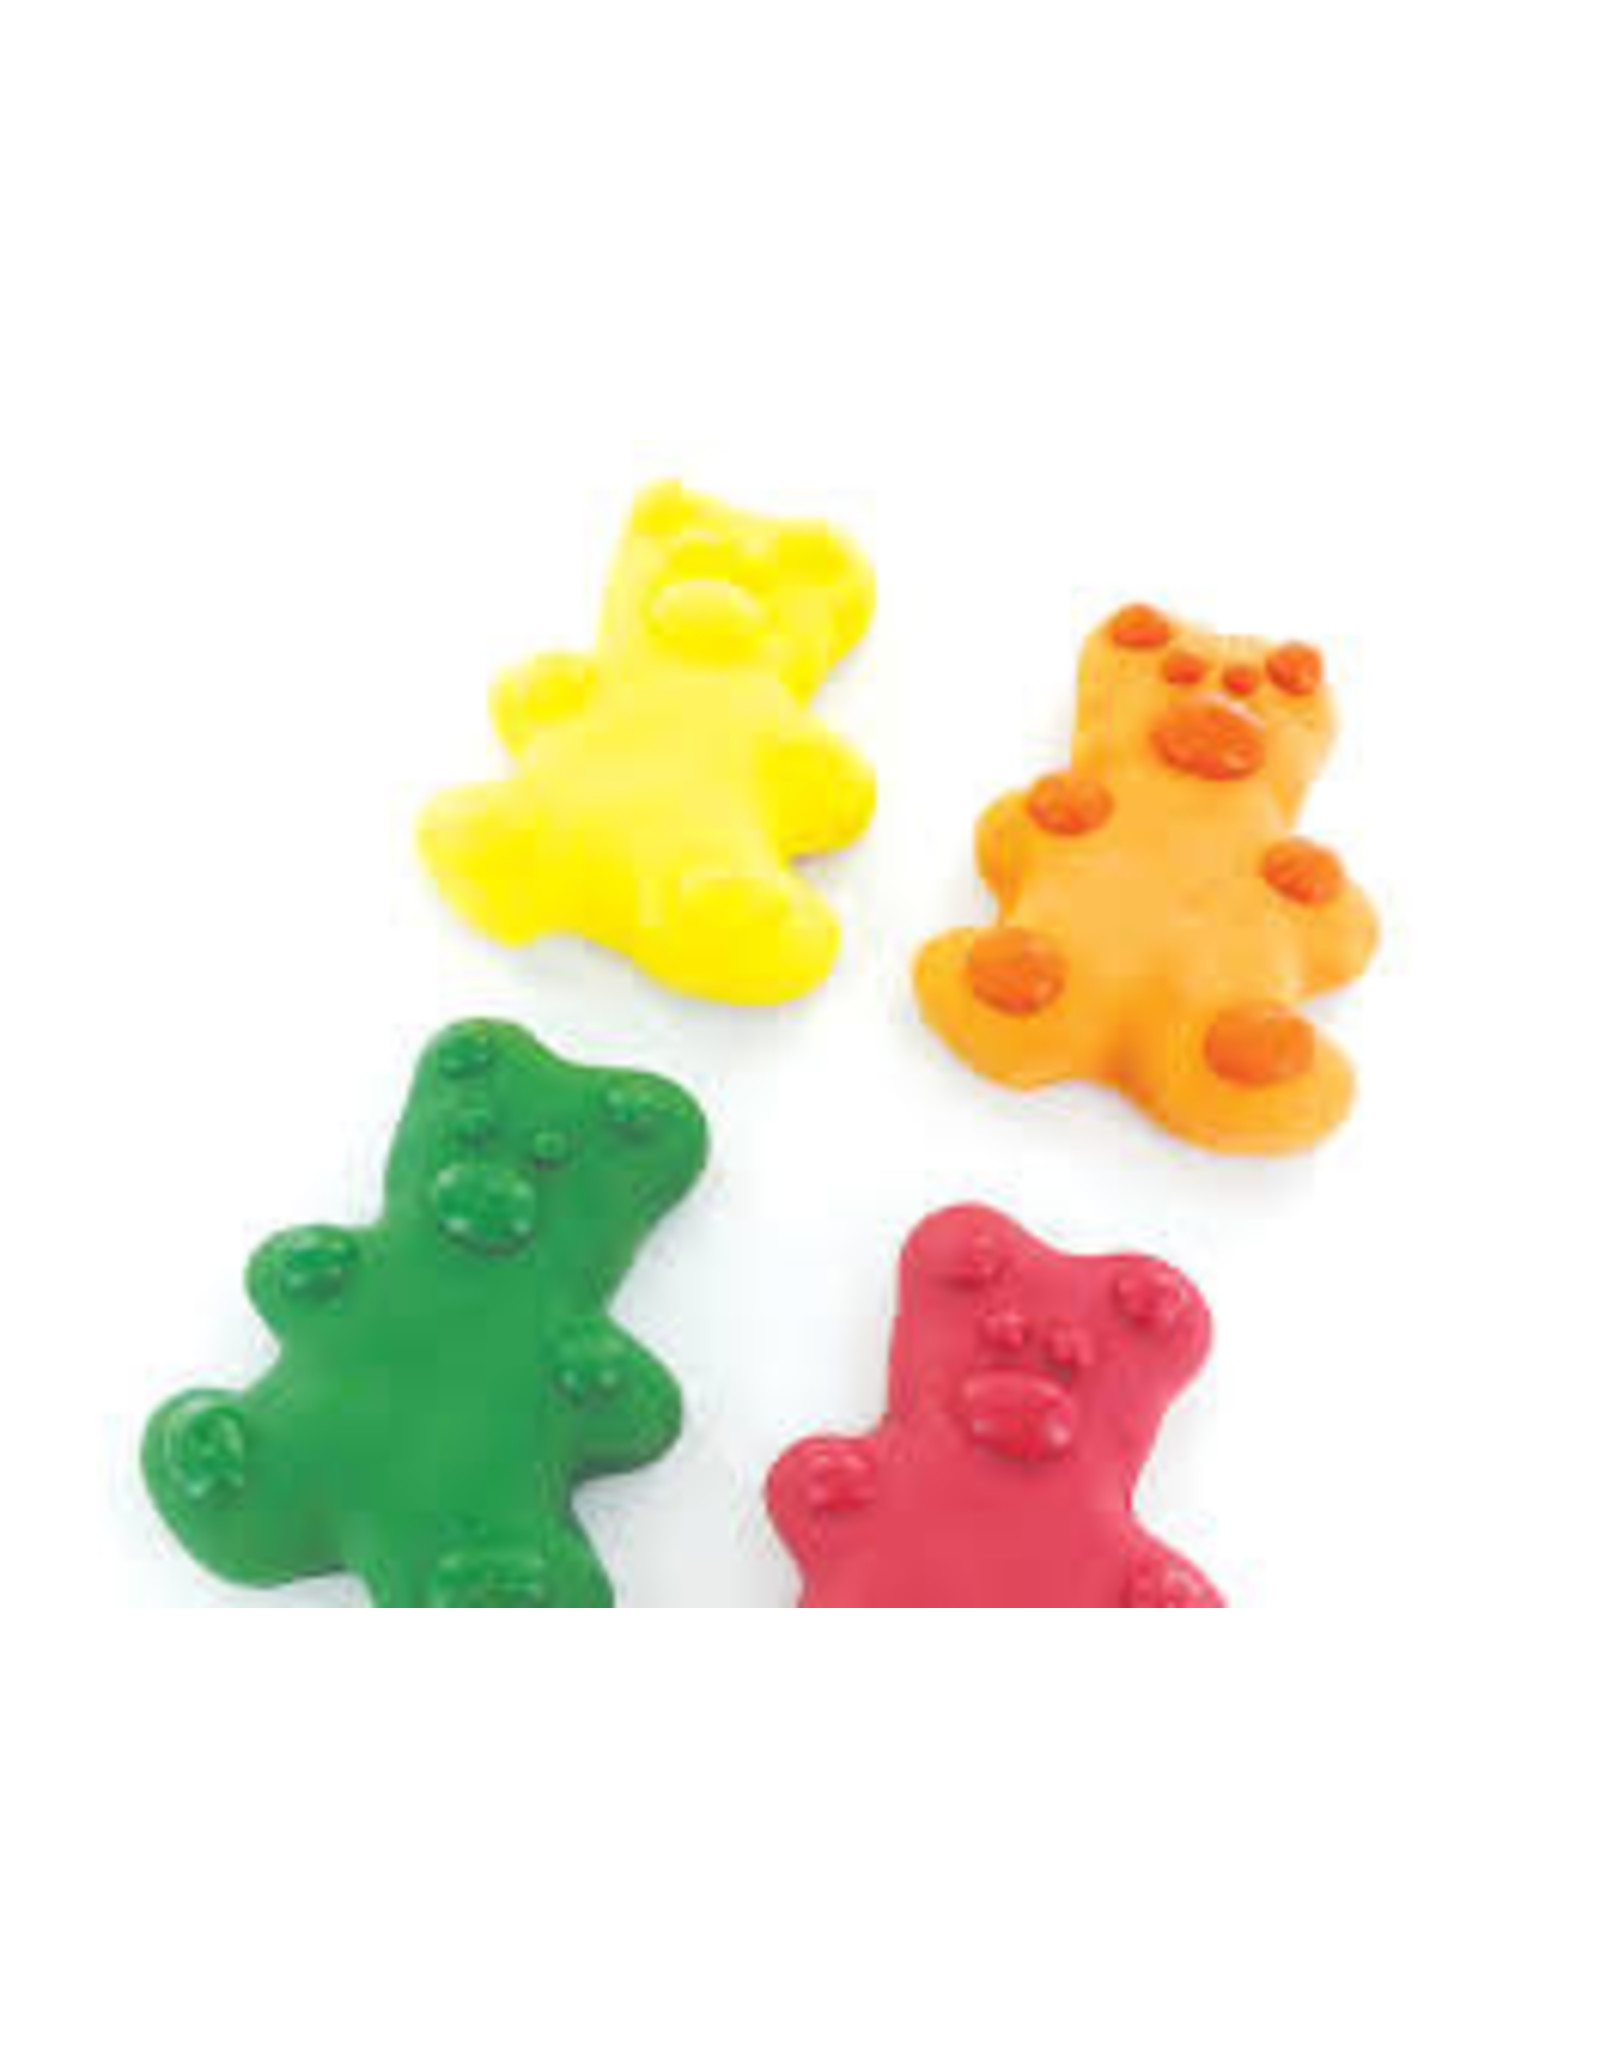 Bosco & Roxy's Bosco+Roxy's JustForLicks Gummy Bears